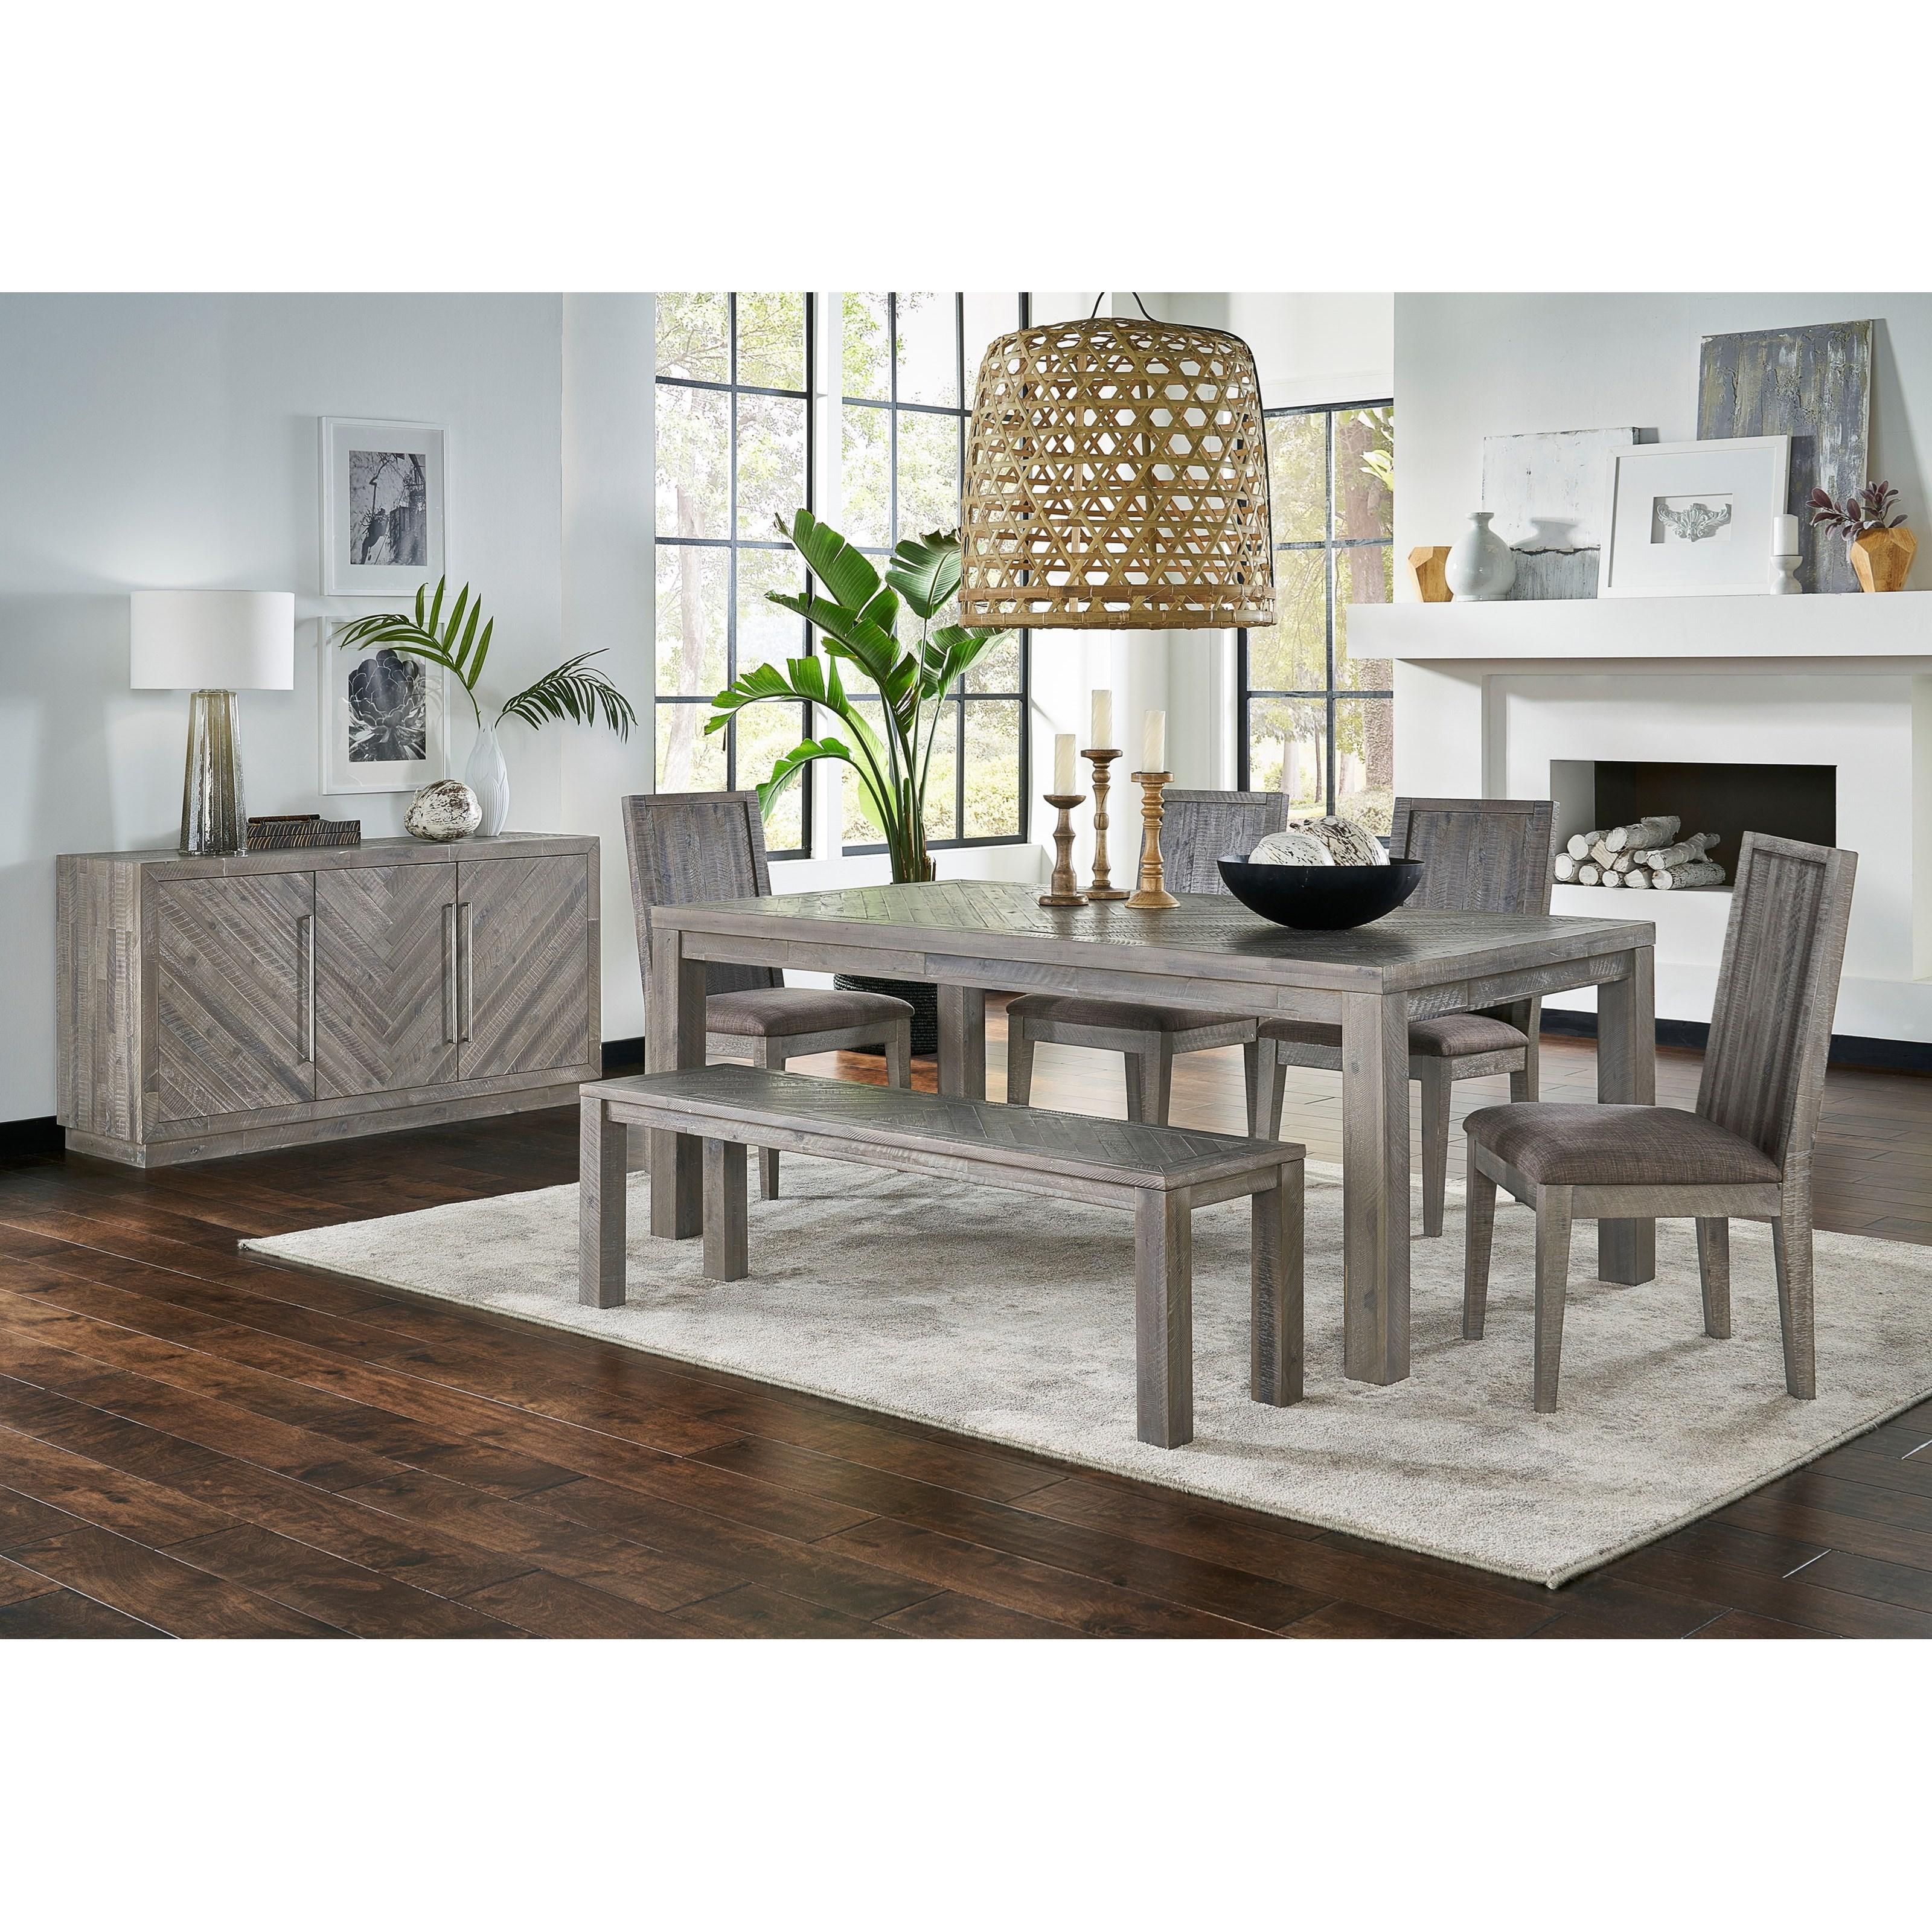 Alexandra Formal Dining Room Group by Modus International at A1 Furniture & Mattress